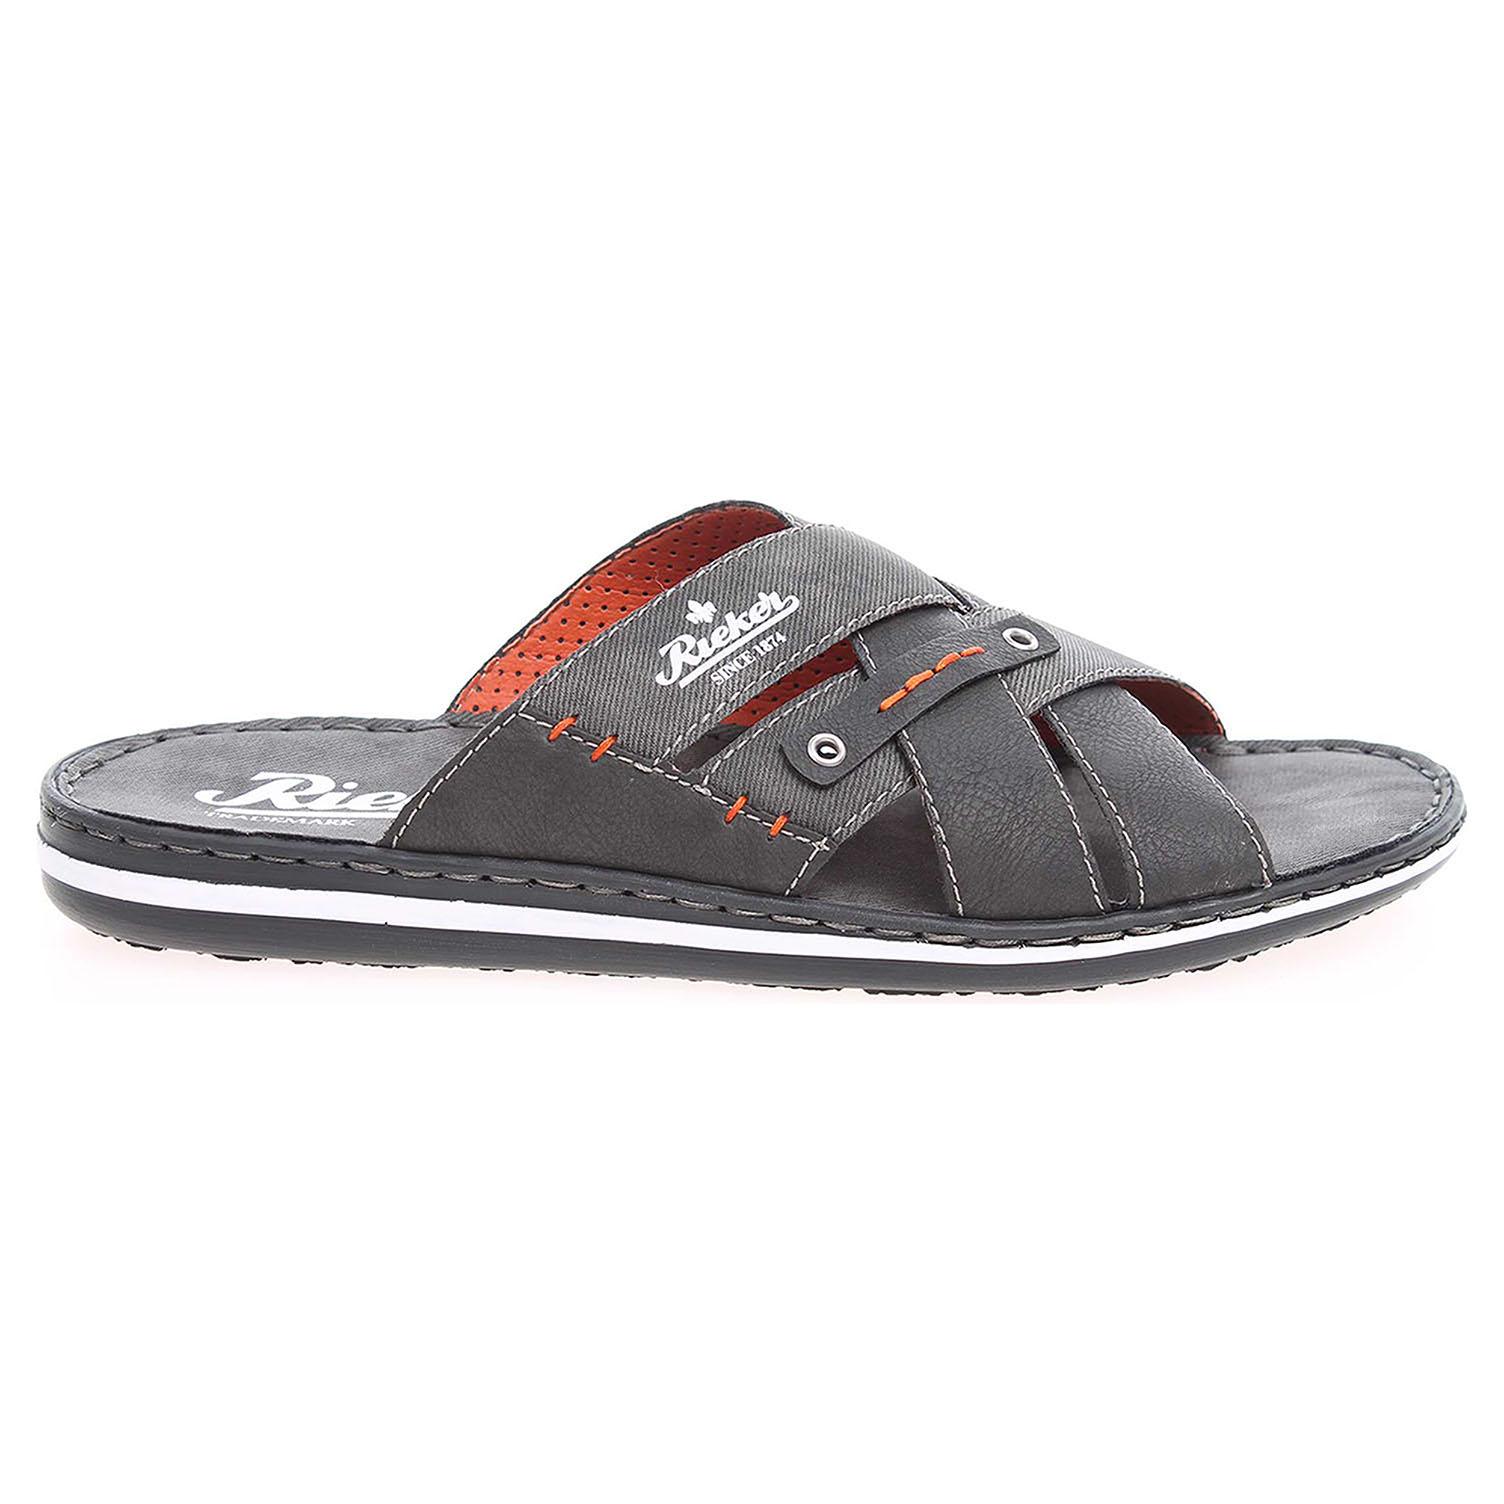 Rieker pánské pantofle 21099-45 šedé 46